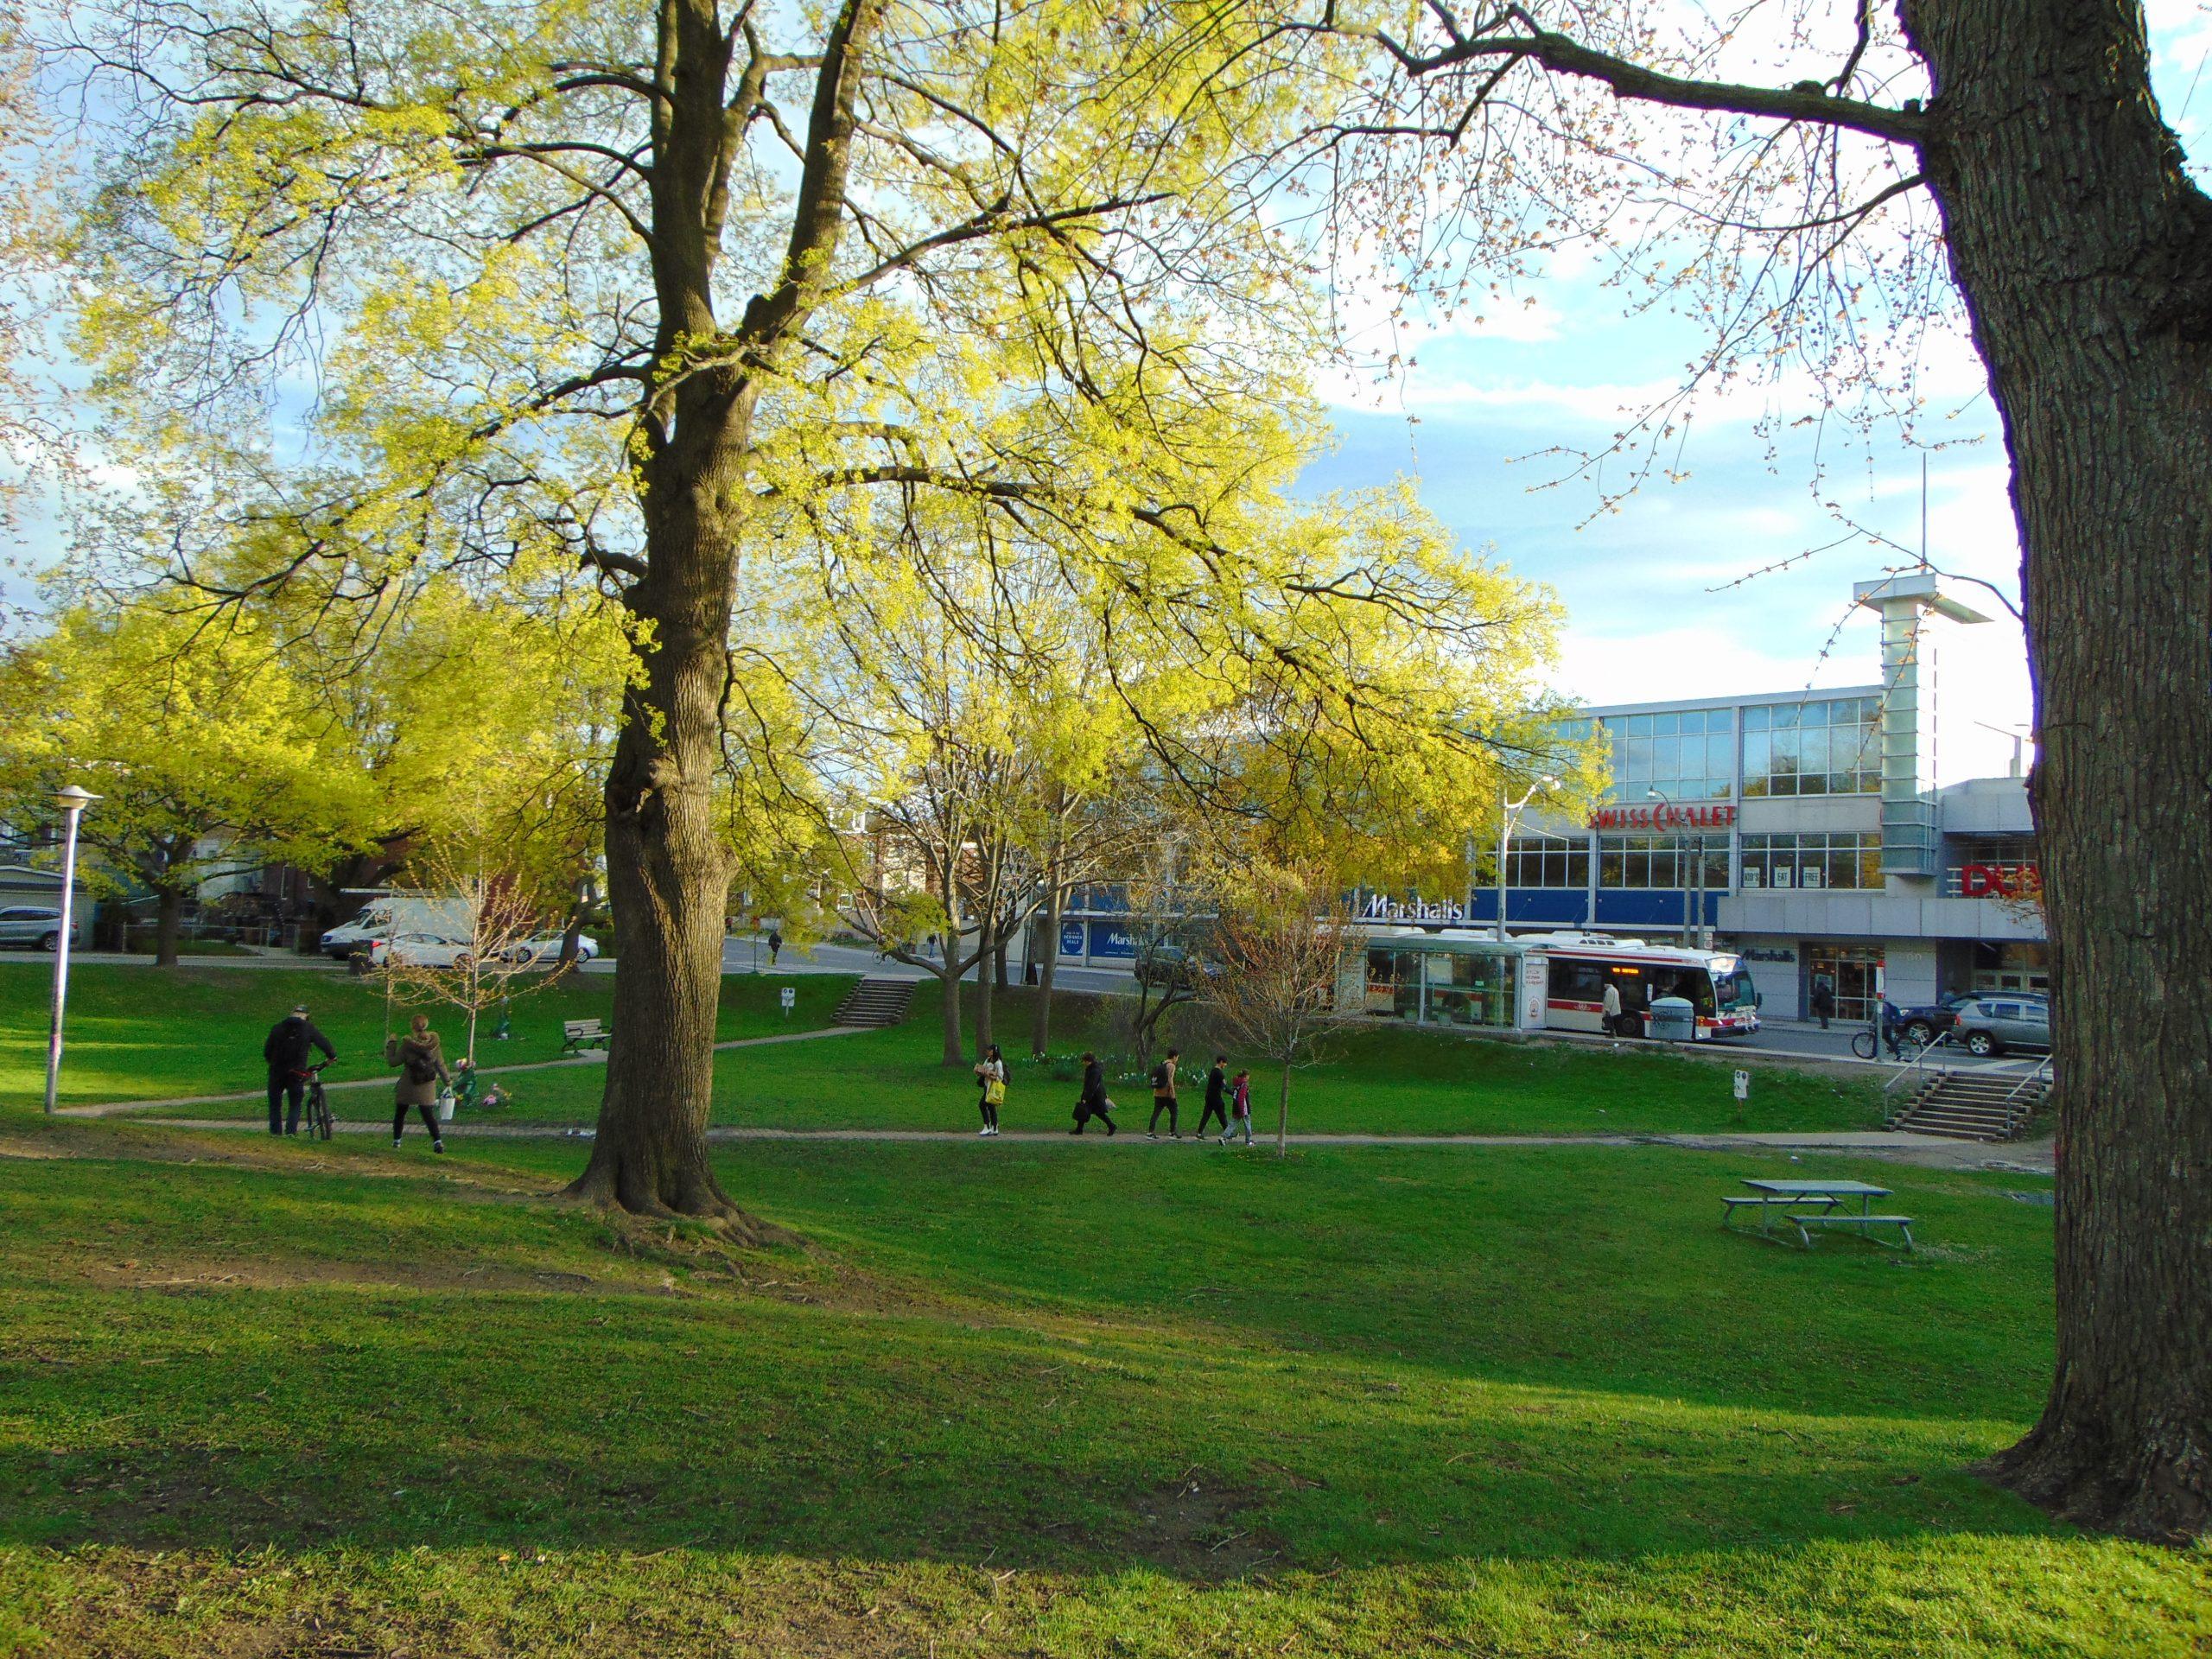 Scene of a park in Canada.